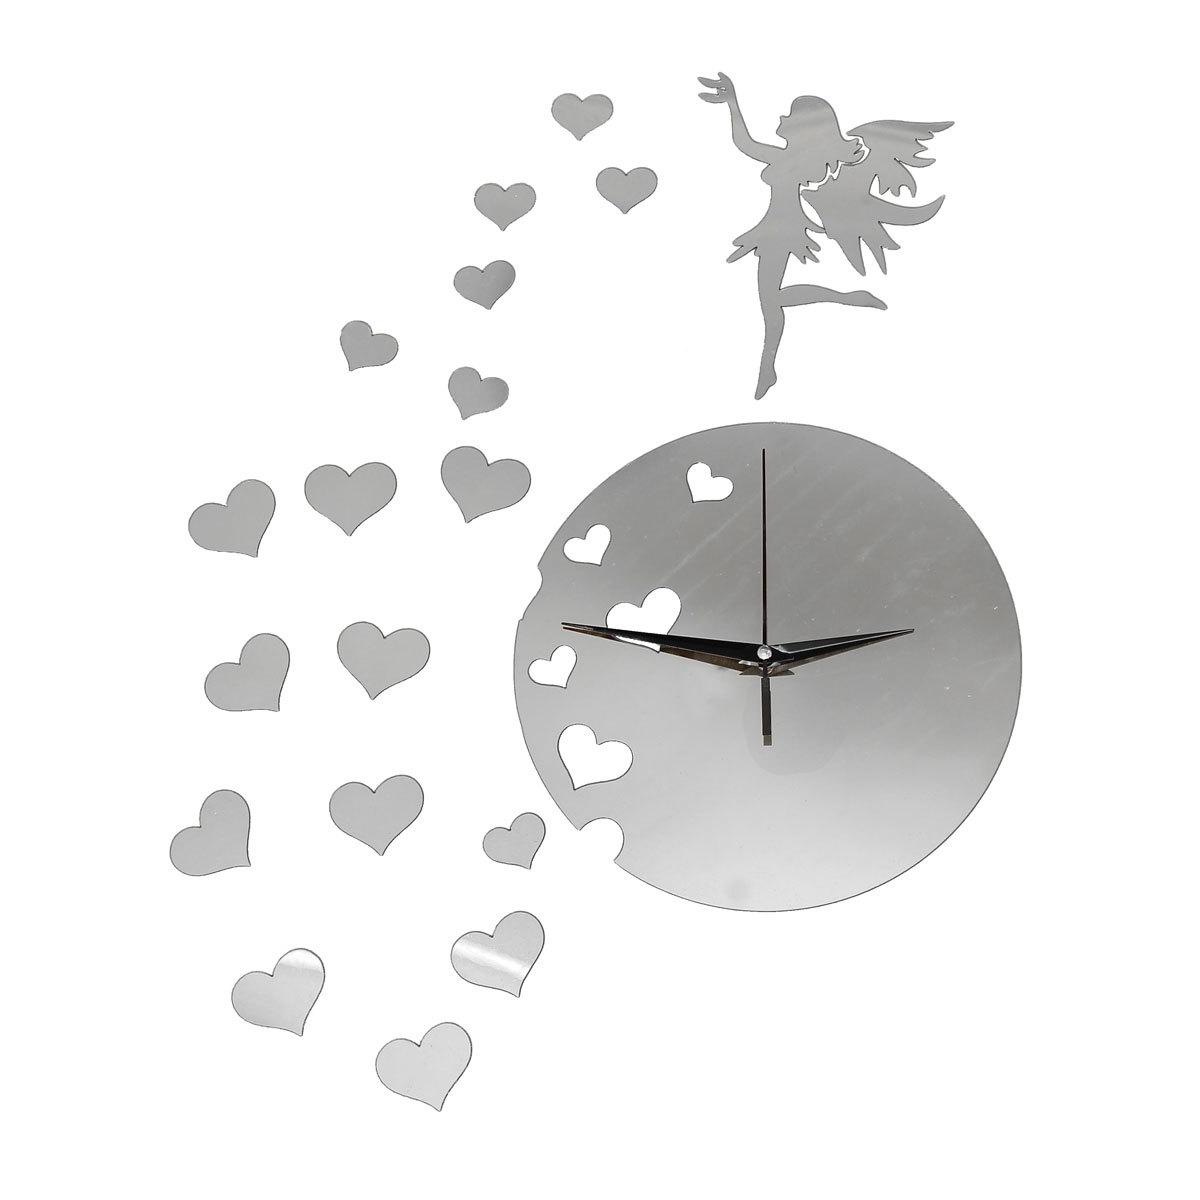 Fairy mirror wall clock 12000 wall clocks diy 3d modern acrylic fairy heart mirror wall clock home amipublicfo Image collections